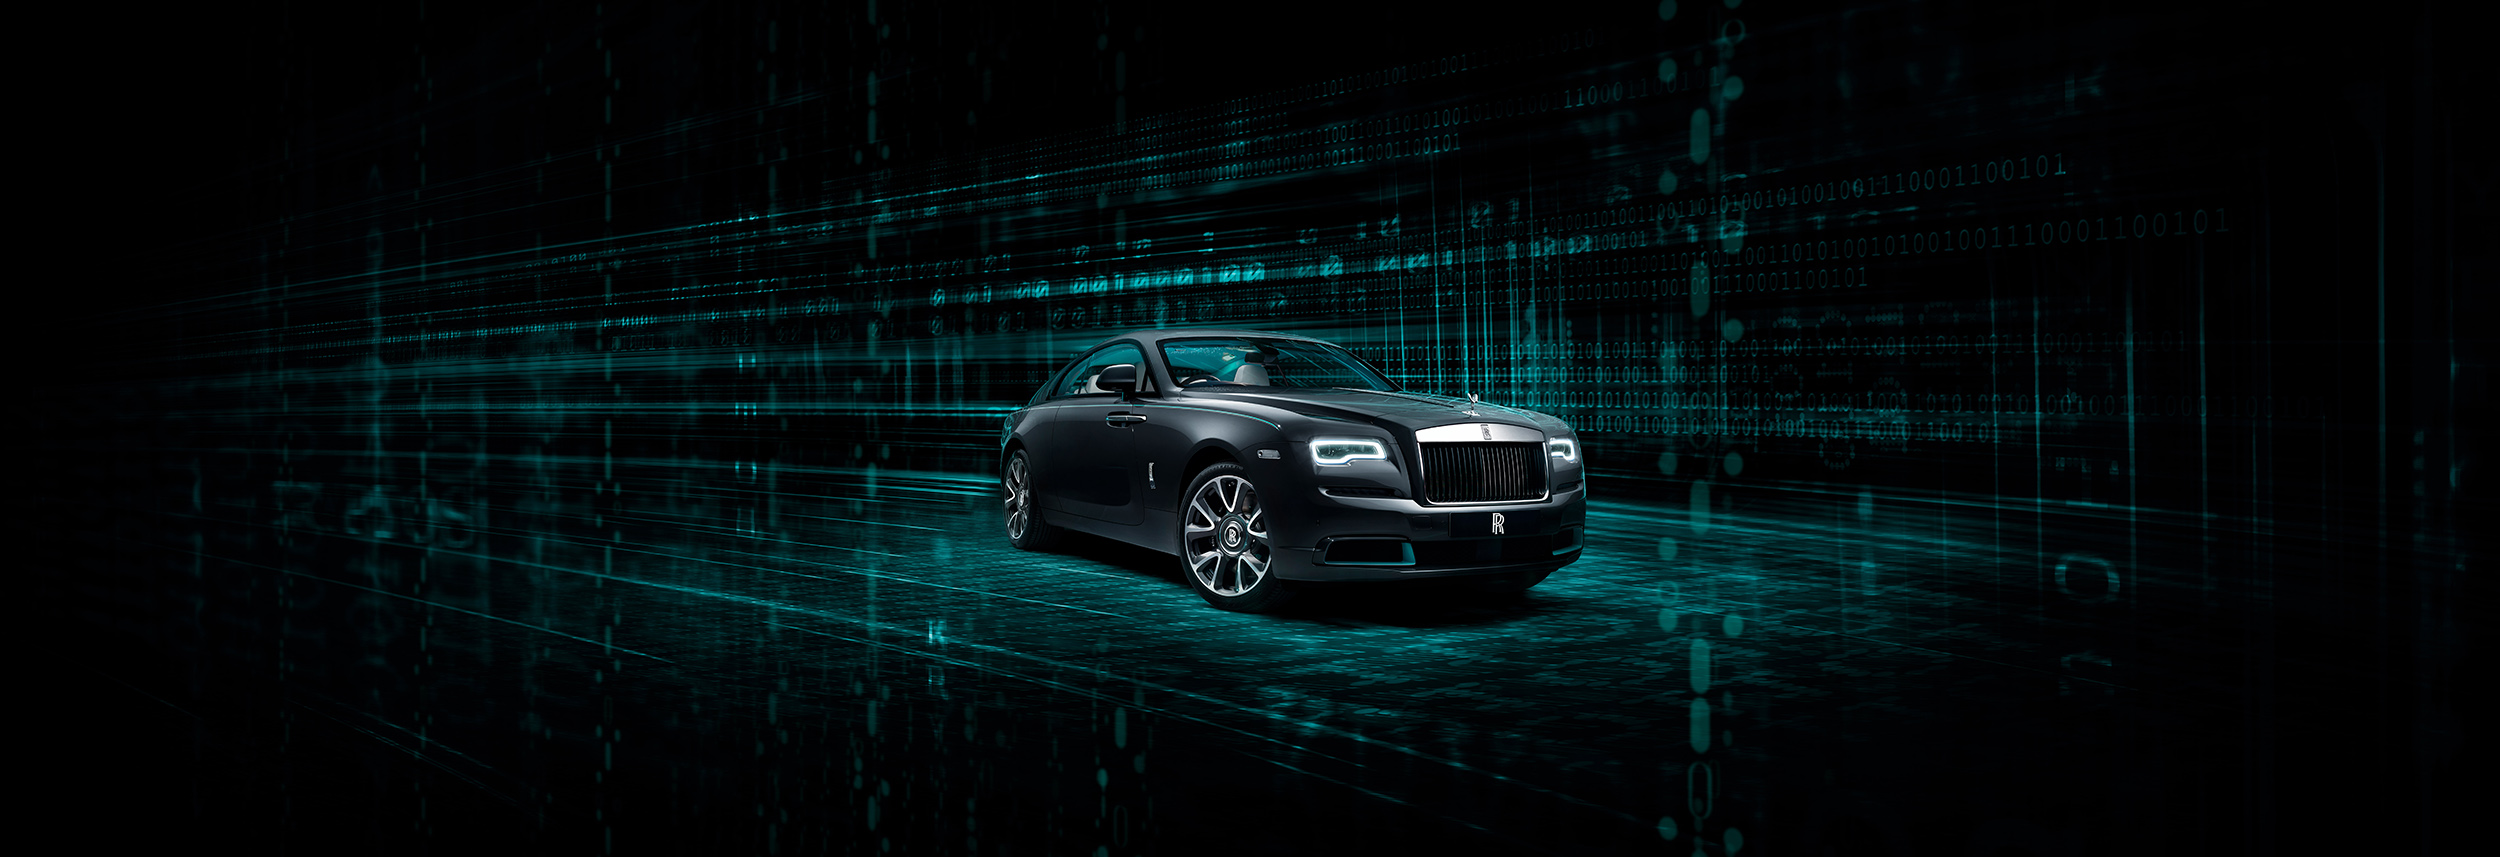 Rolls-Royce Wraith_Kryptos_Front3_4_V1b_V08_CODE